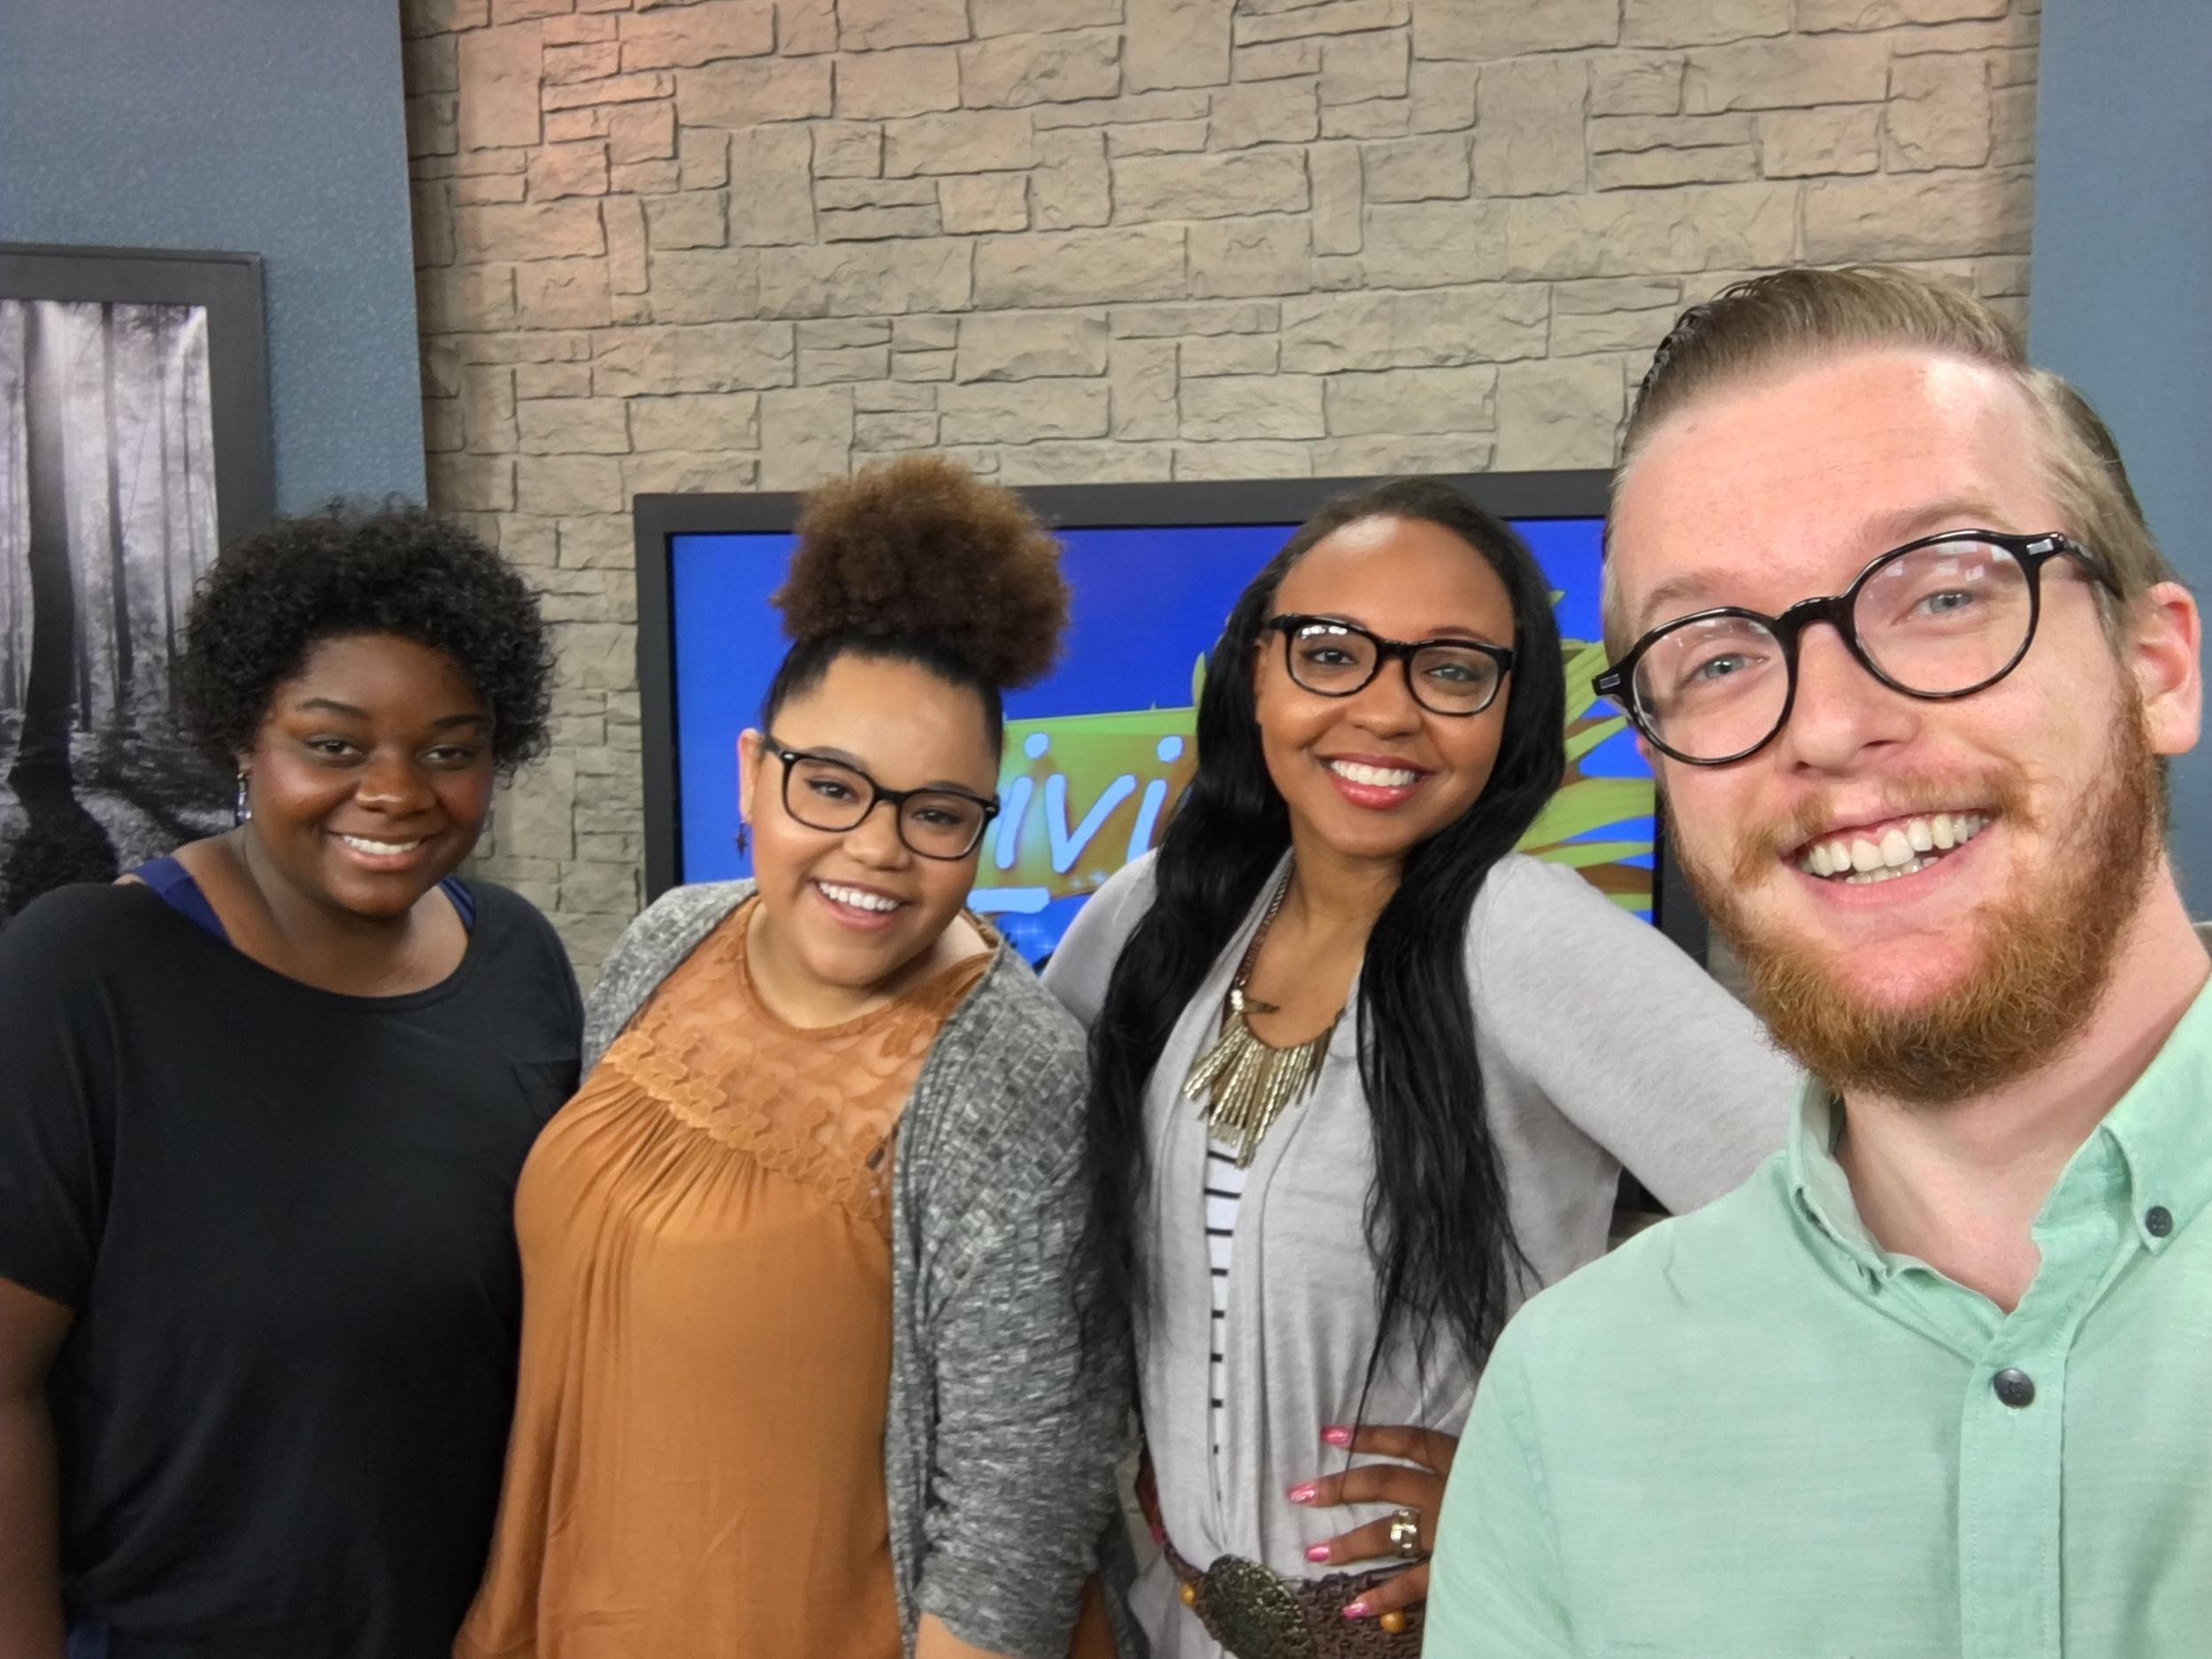 With J'Lyn Hope, Tafadzwa Diener, and Jasmine Dandridge on the set of ciLiving, 8/1/2016